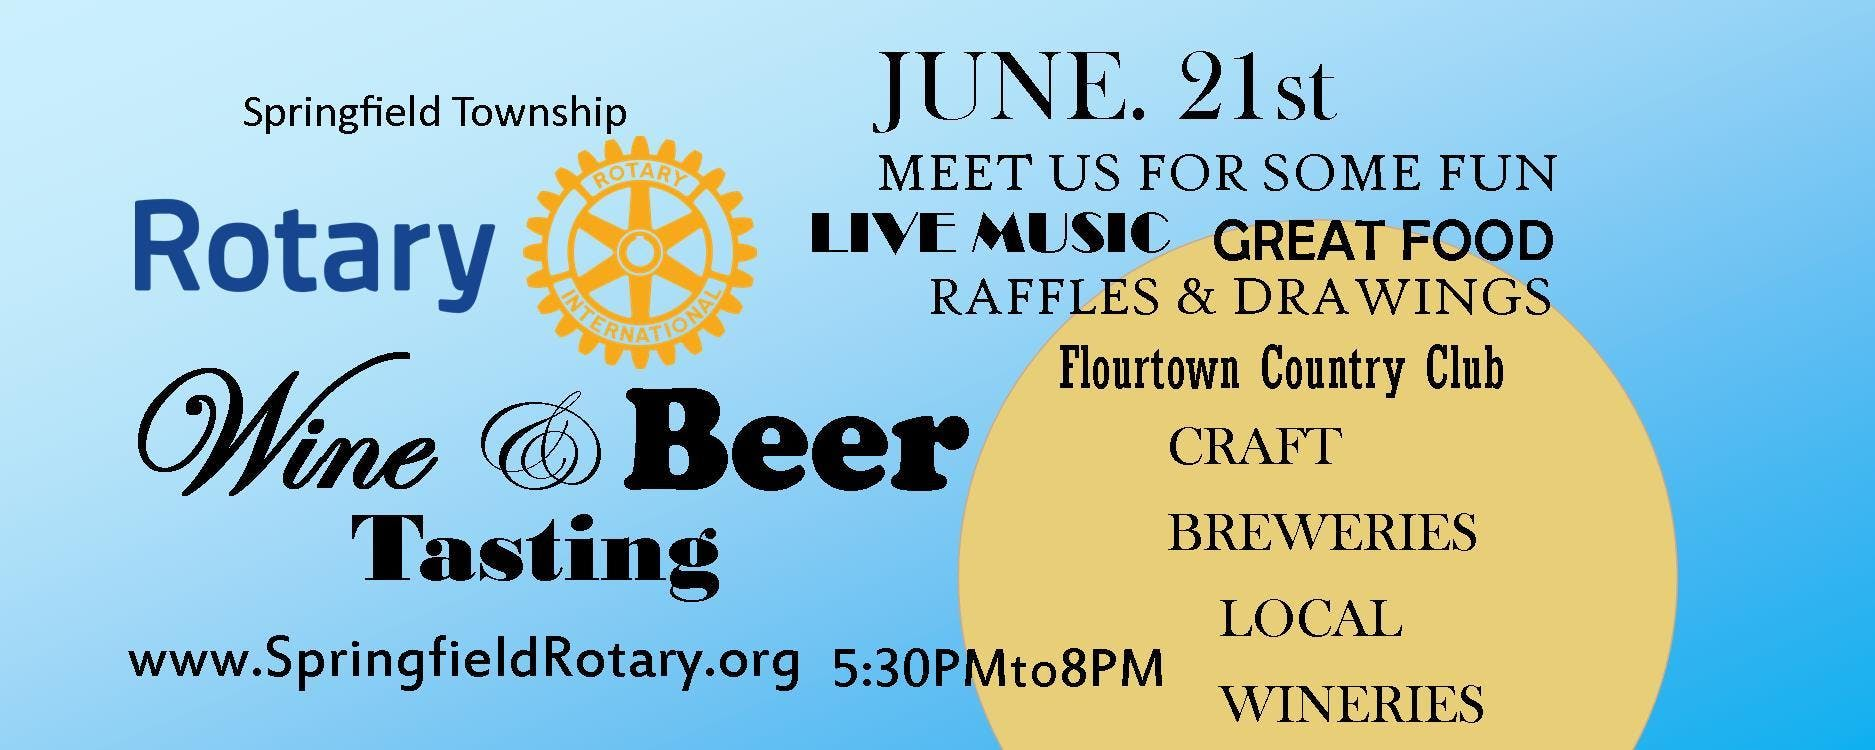 Springfield Township Rotary Club 1st Annual W